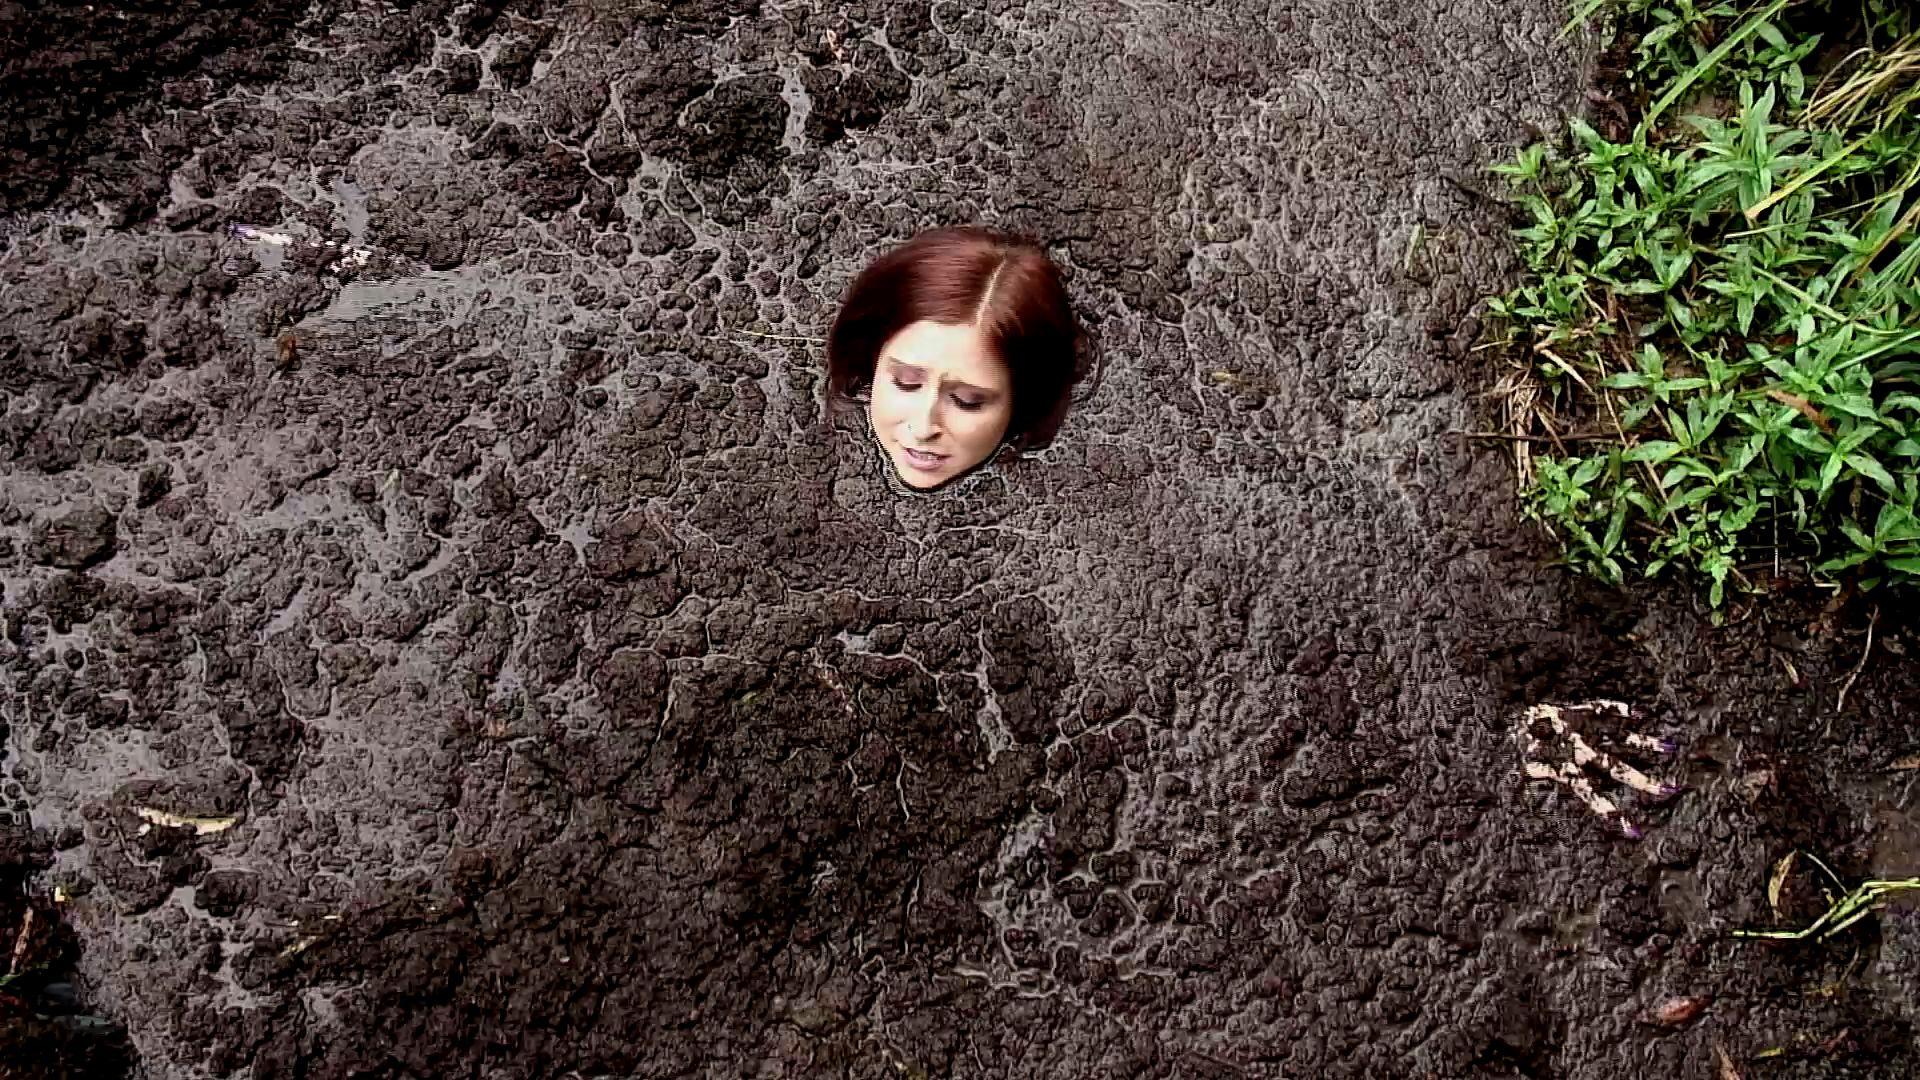 Paris Kennedy quicksand Paris-sinking-solo-in-the-bog_19